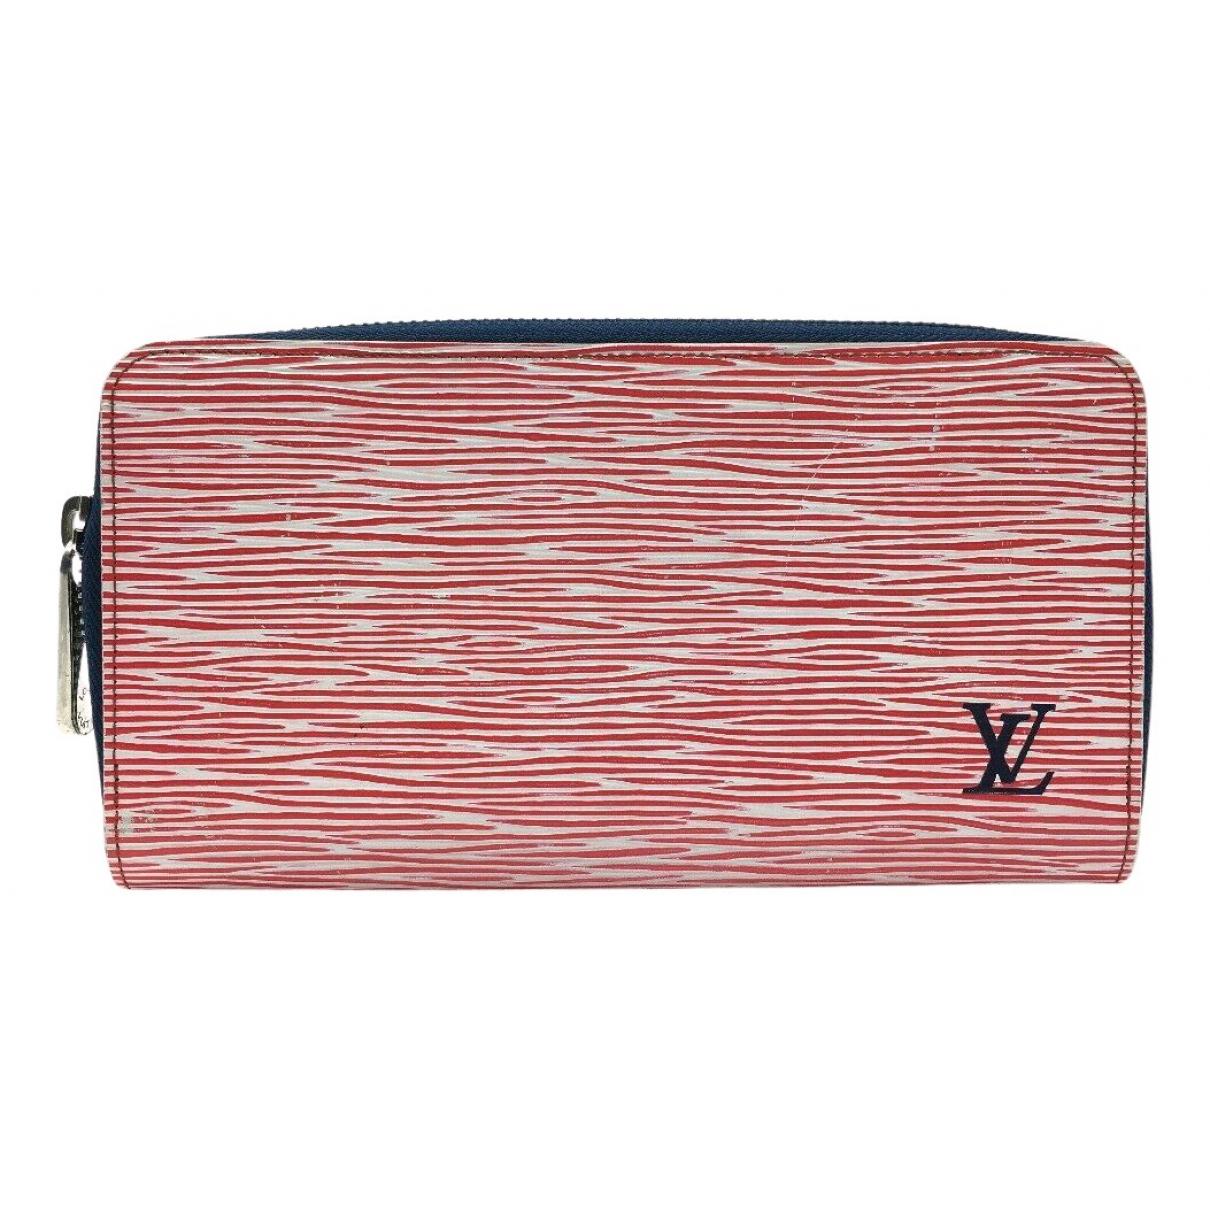 Louis Vuitton Zippy Portemonnaie in  Rot Leder